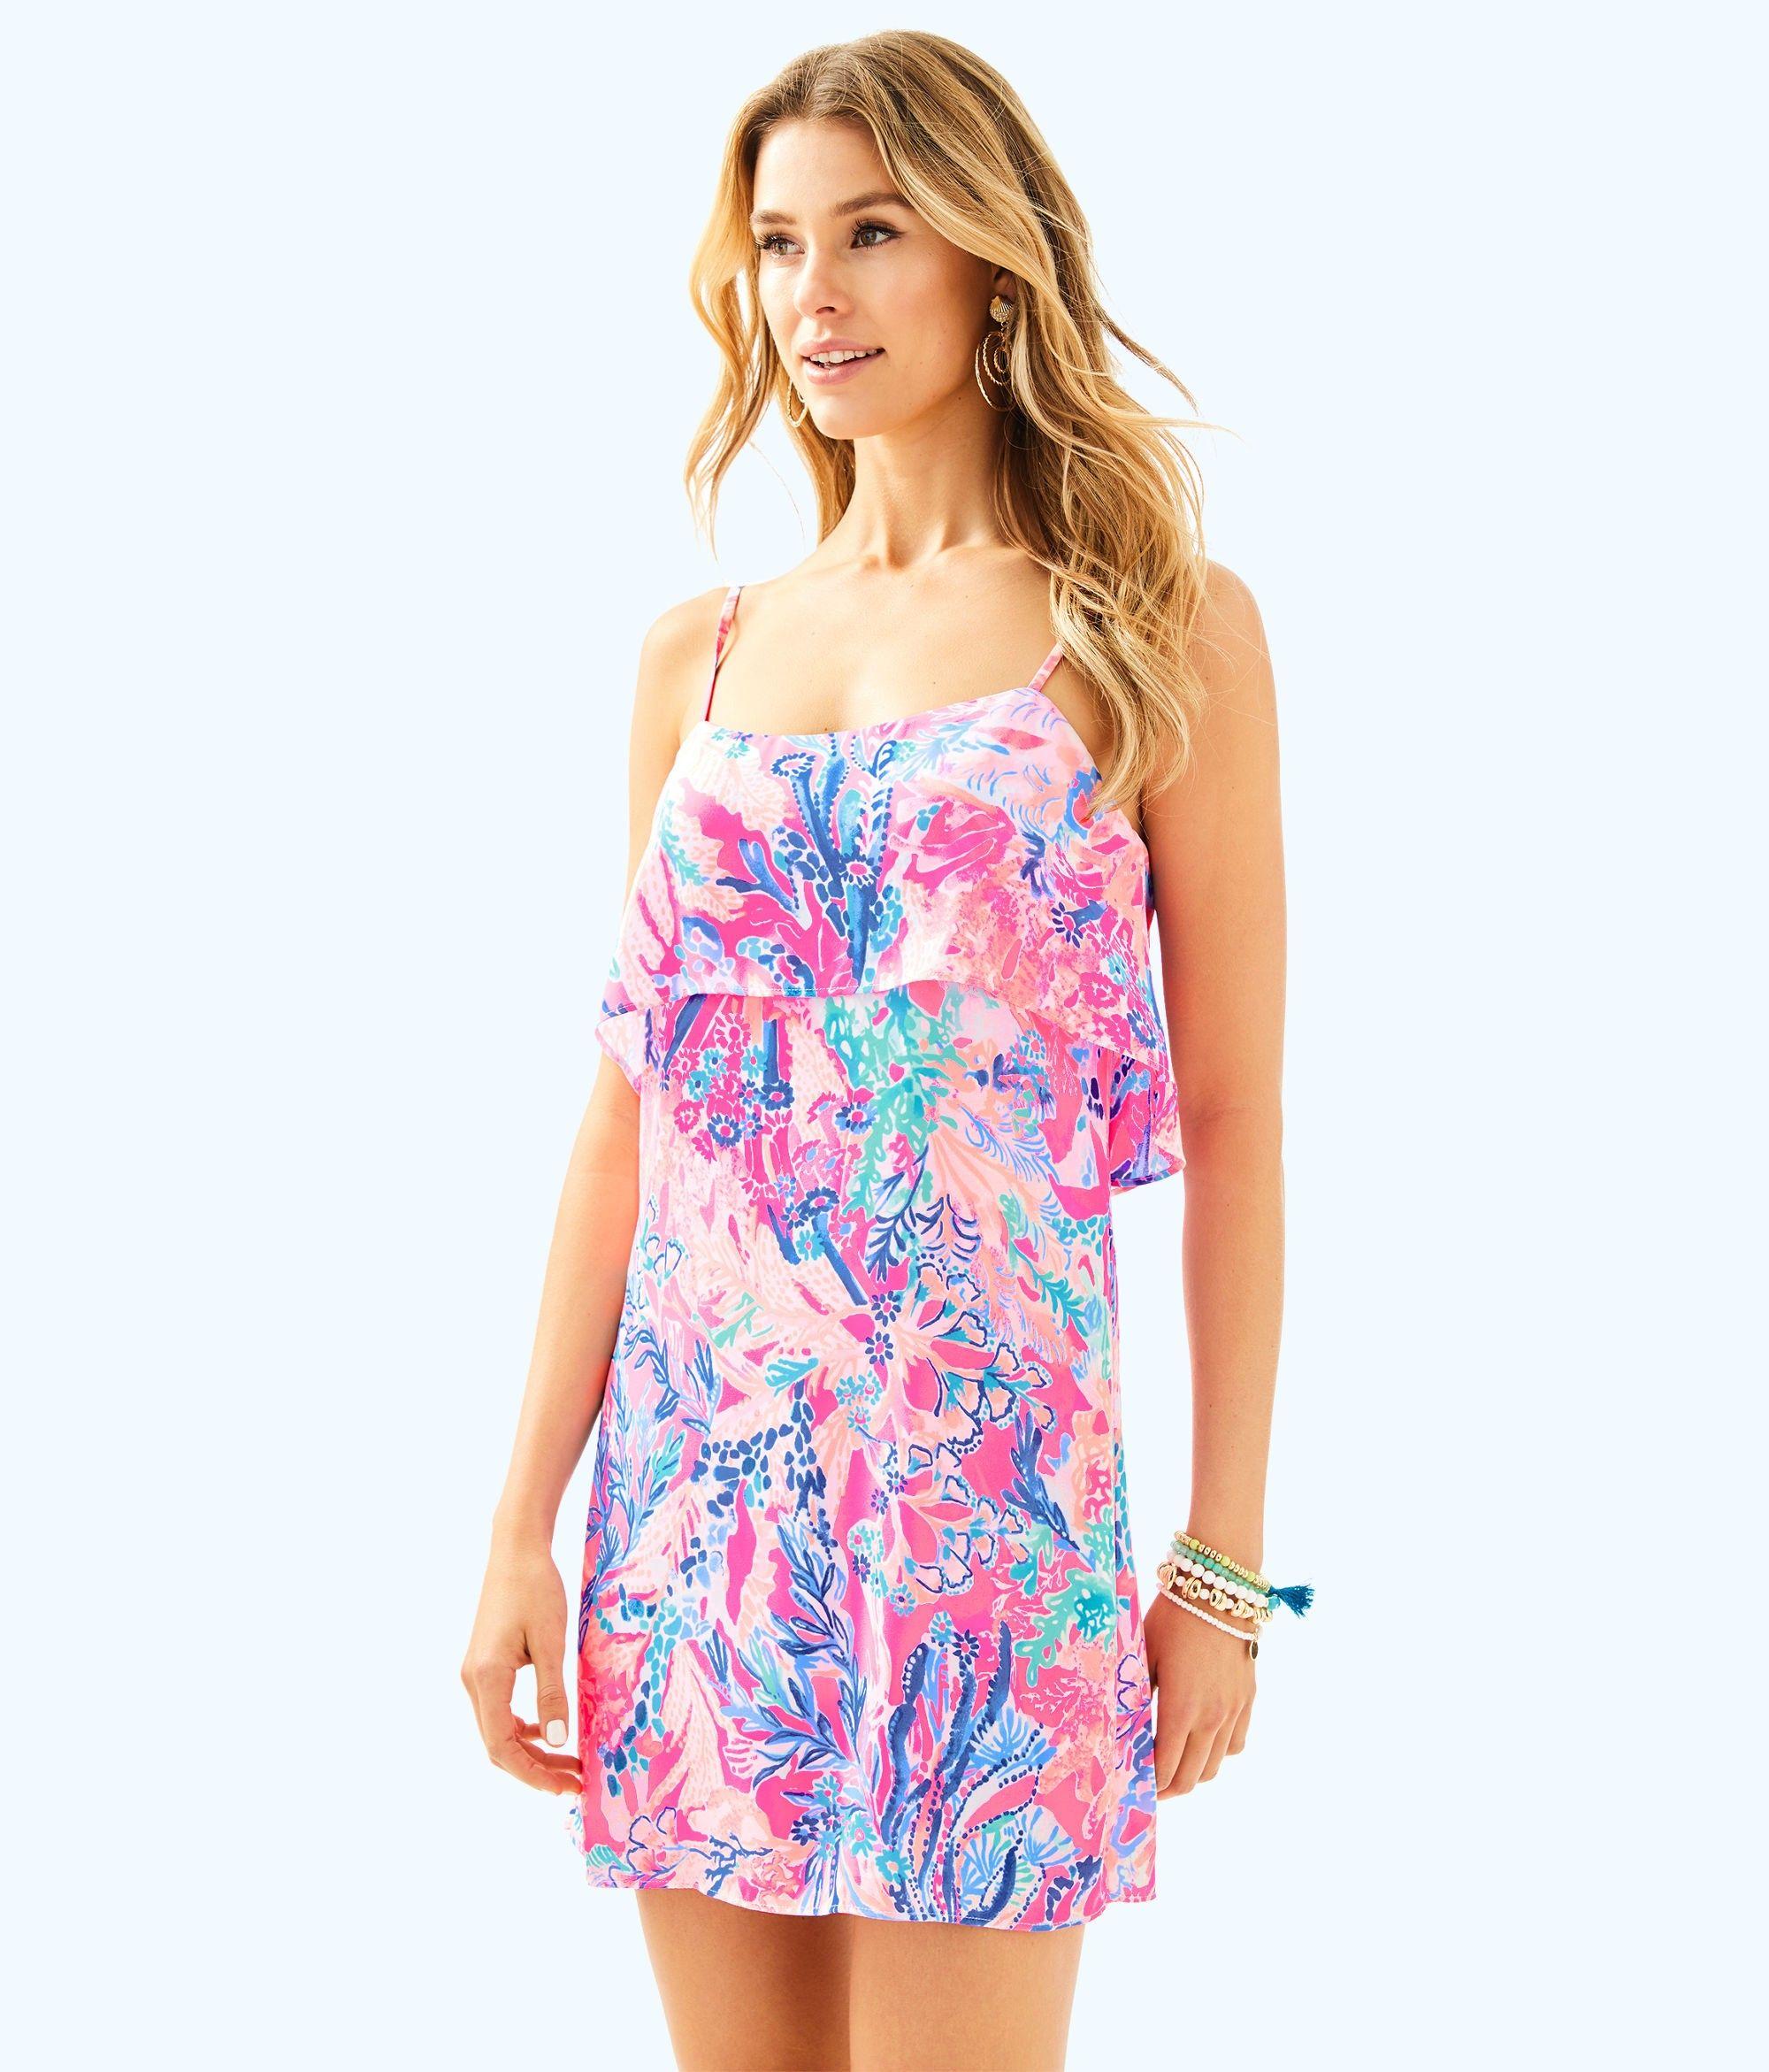 38408c6ea39a58 Lilly Pulitzer Lexi Dress - XXS | Products | Dresses, Summer dresses ...